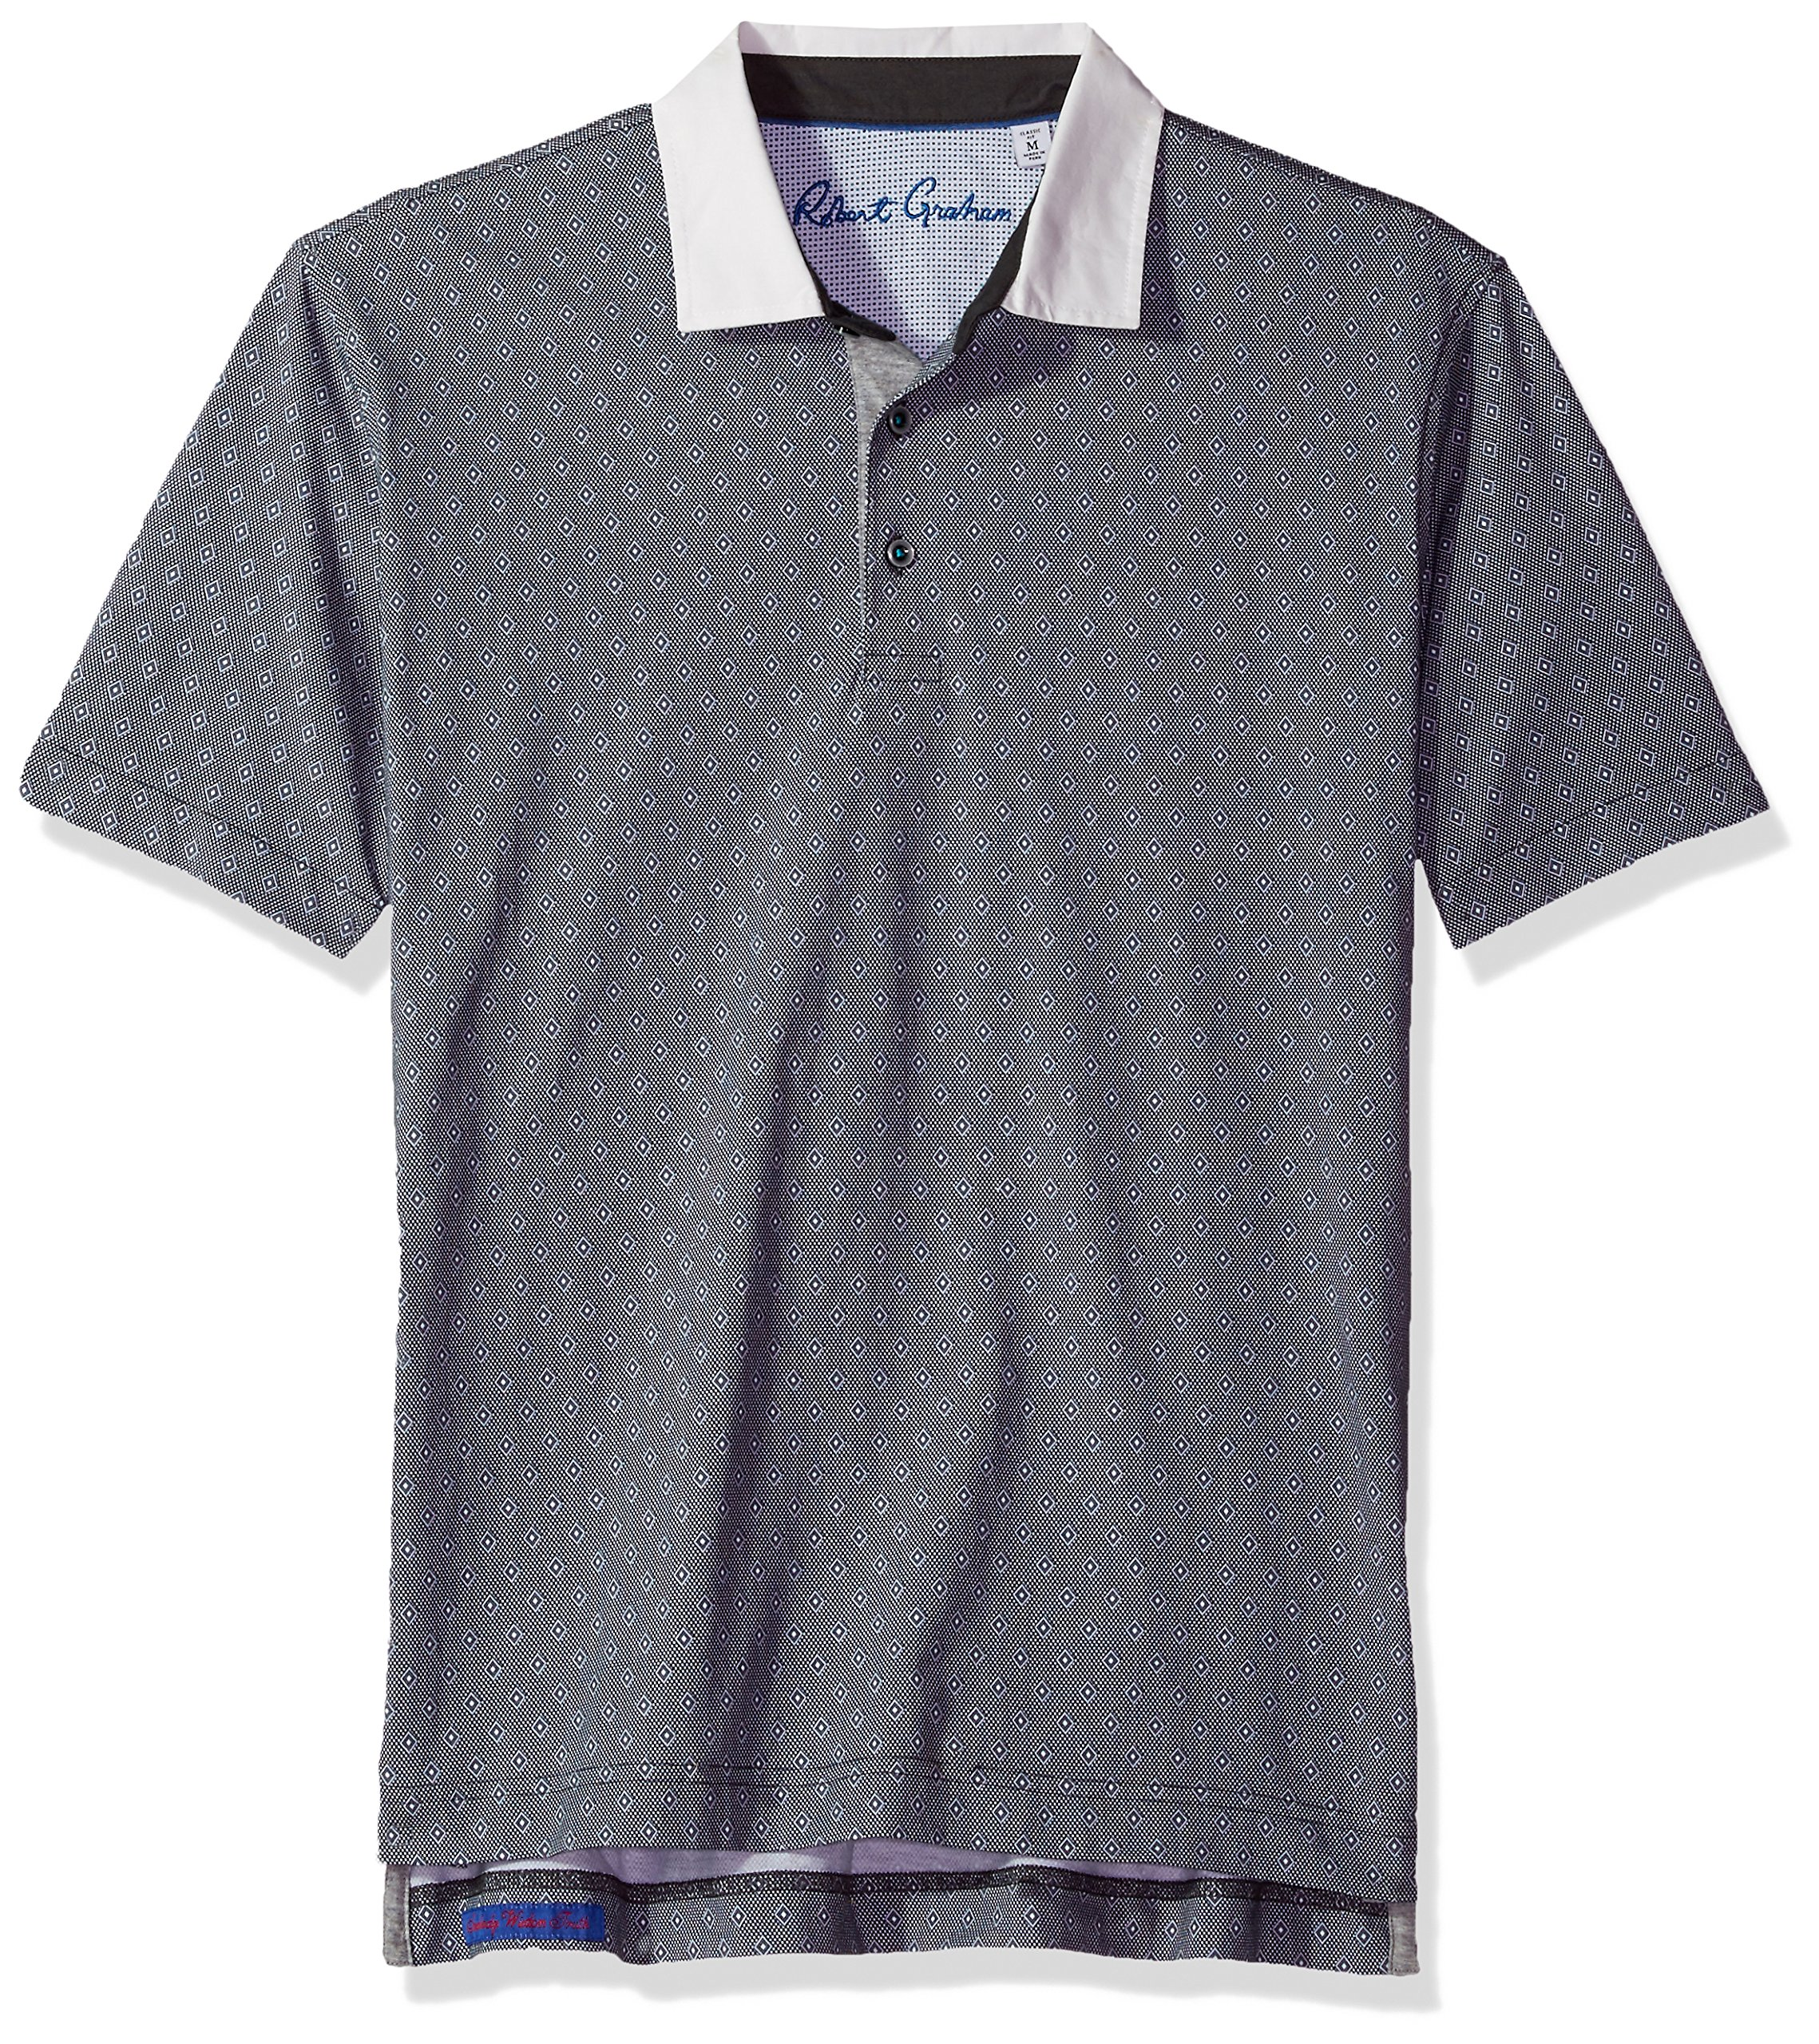 Robert Graham Men's Osaka Short Sleeve Pima Cotton Knit Polo, Charcoal, 3XLARGE